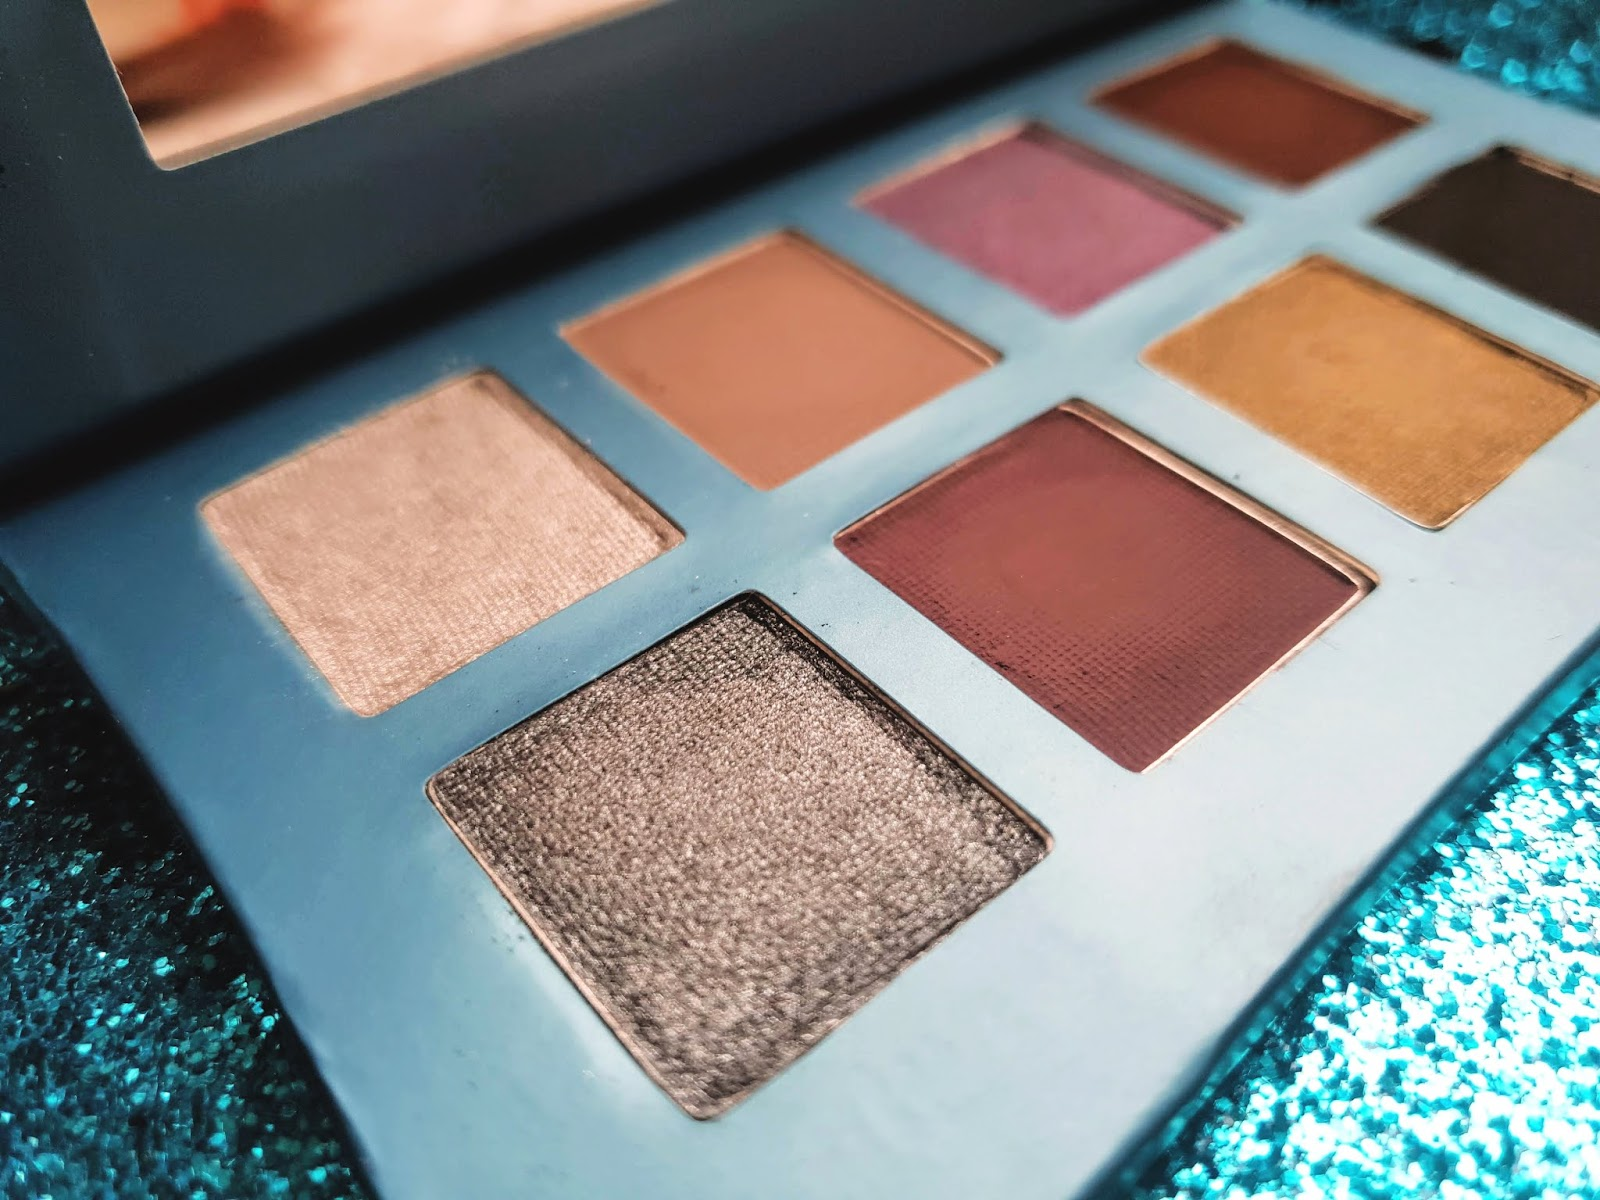 Illamasqua Shiver Palette review